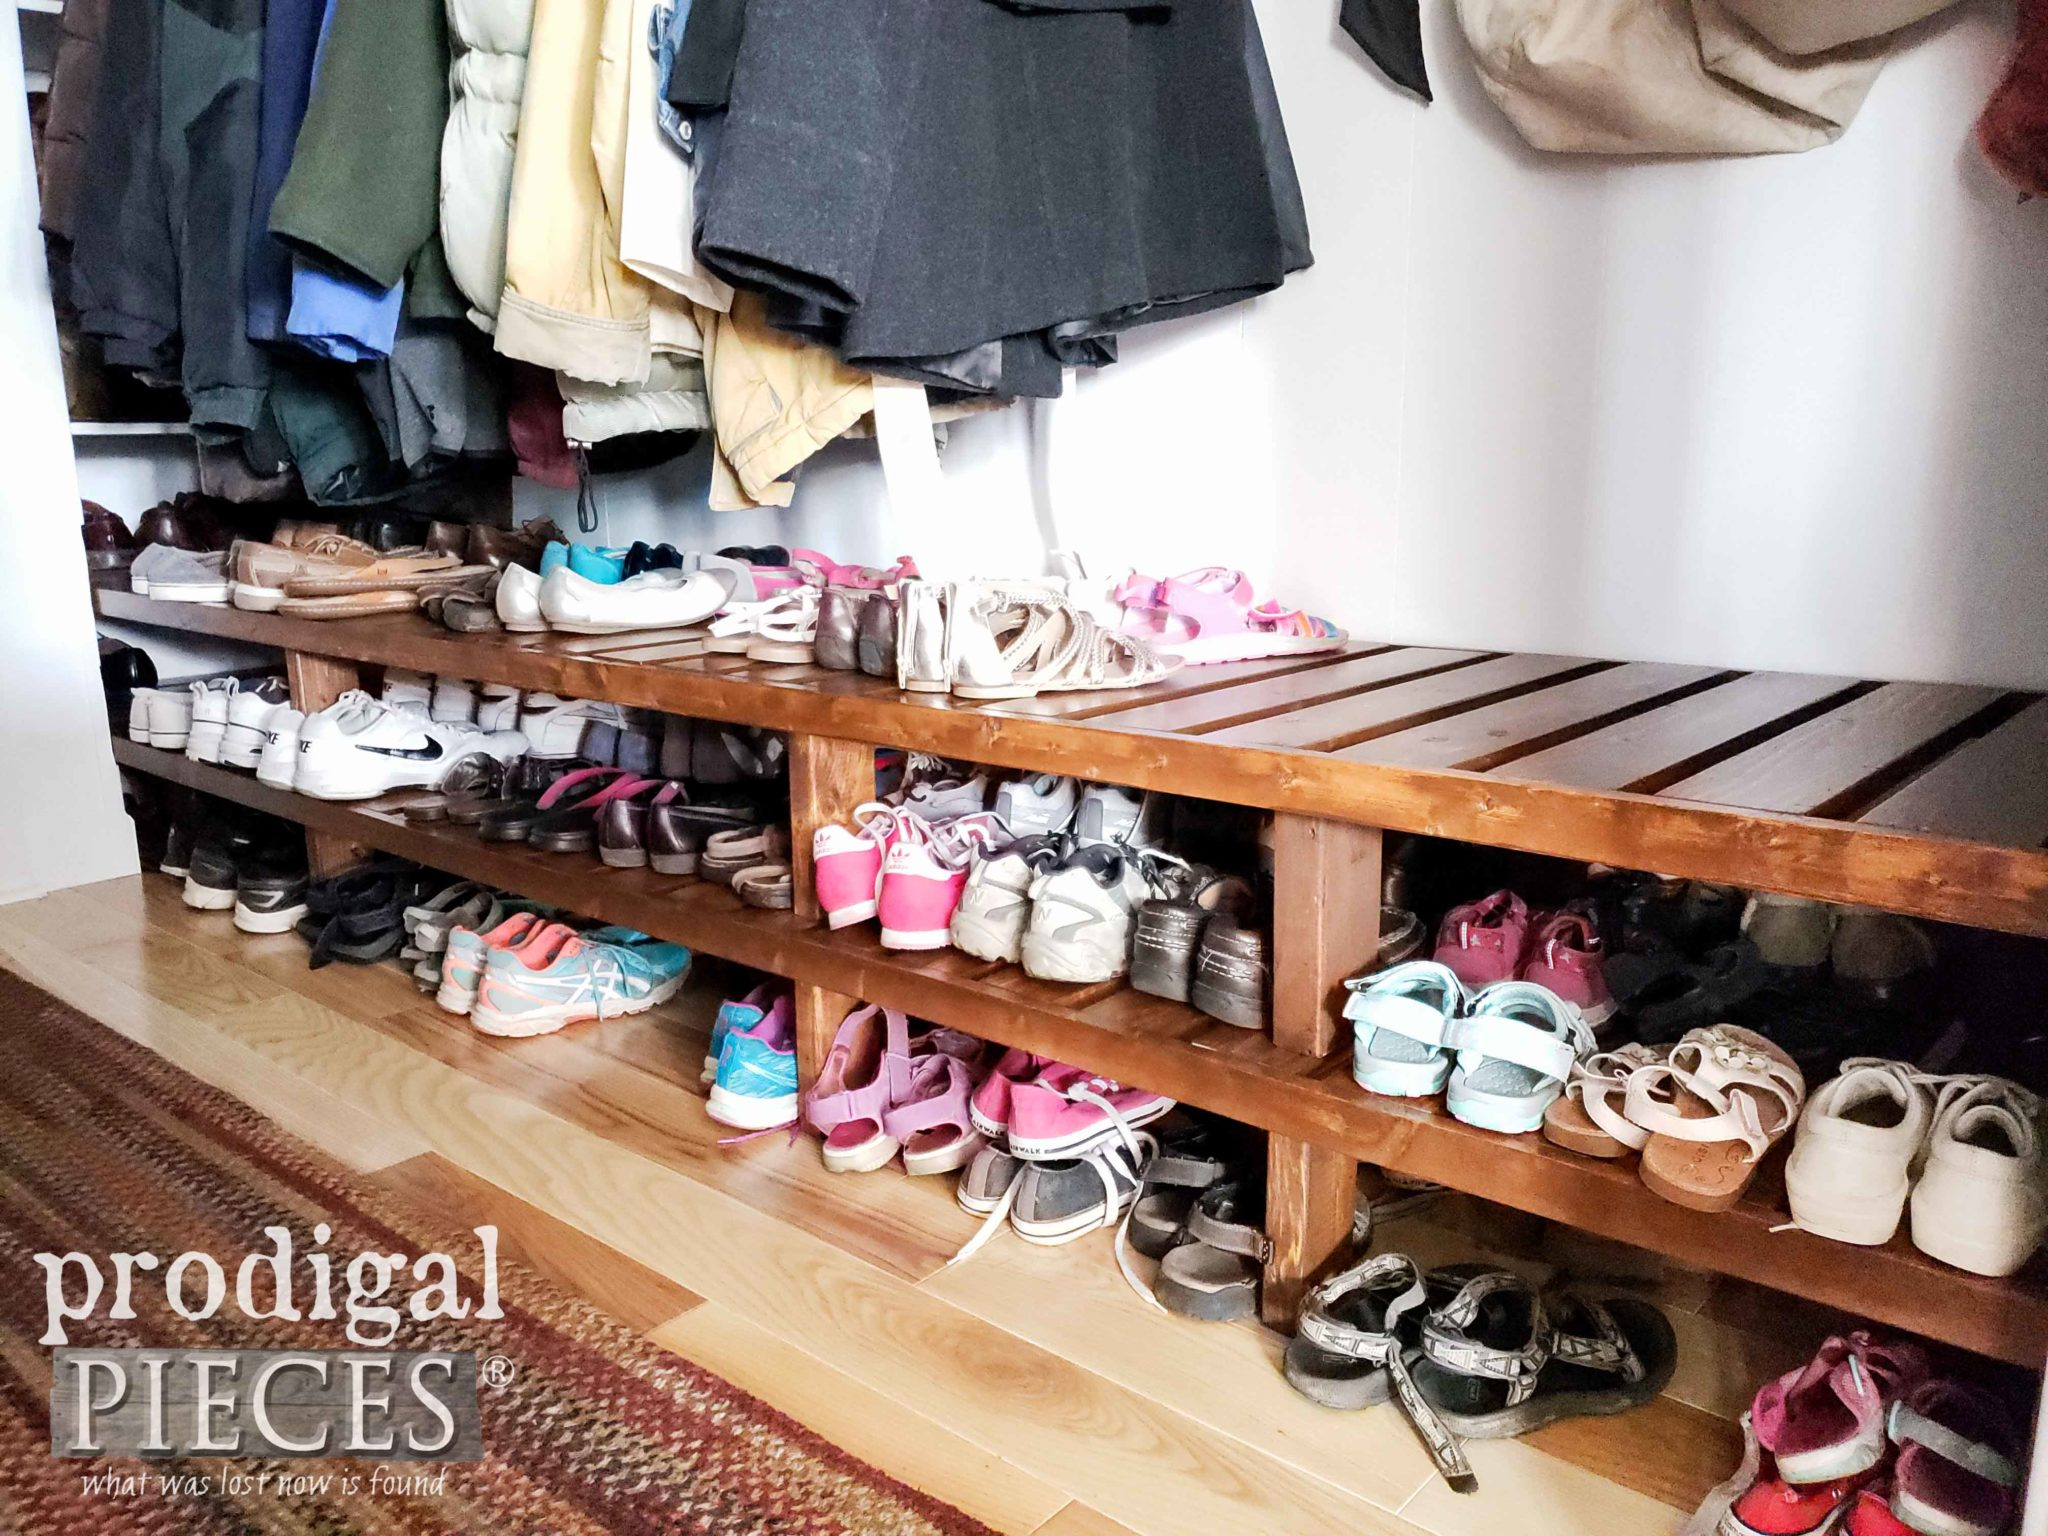 Custom Built-In Farmhouse Style Shoe Storage by Larissa of Prodigal Pieces | prodigalpieces.com #prodigalpieces #diy #home #storage #farmhouse #homedecor #homeimprovement